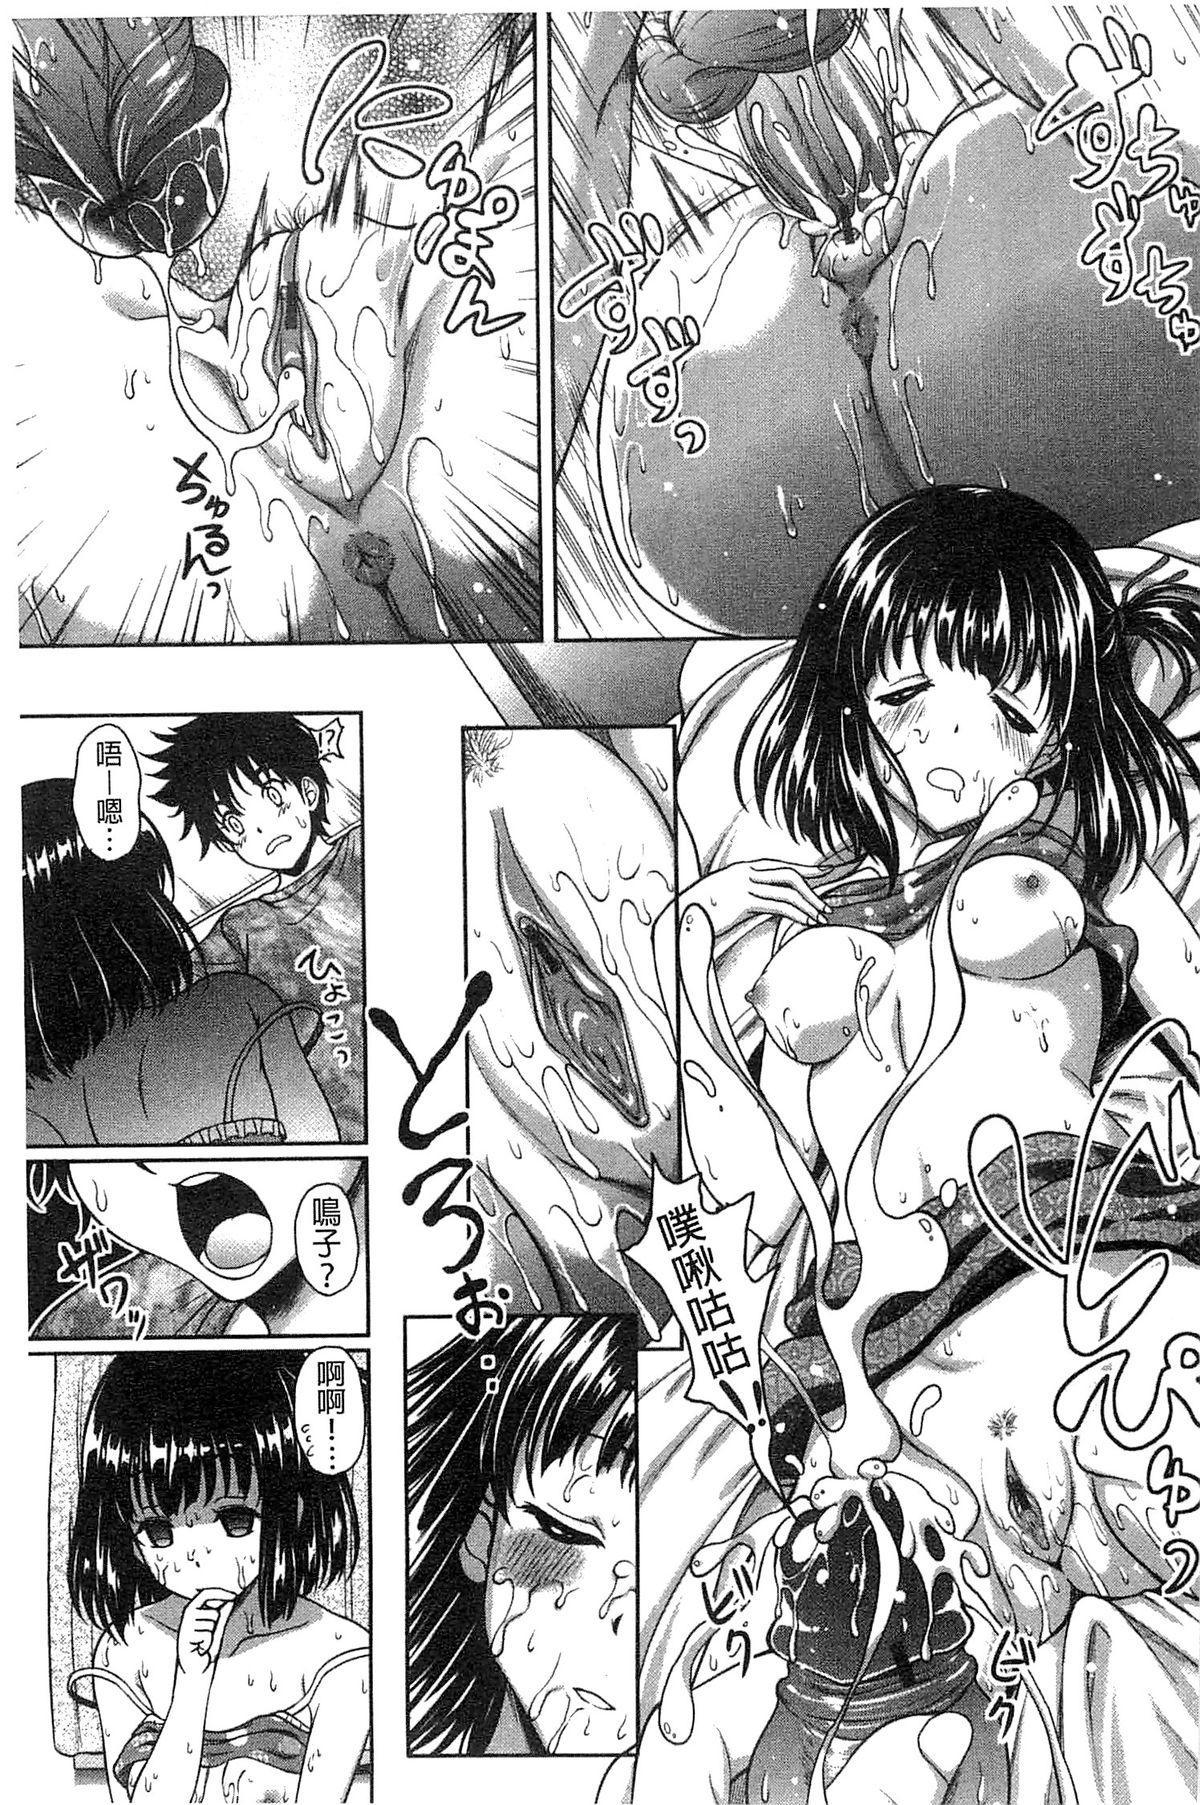 Hajimete nan da kara 89